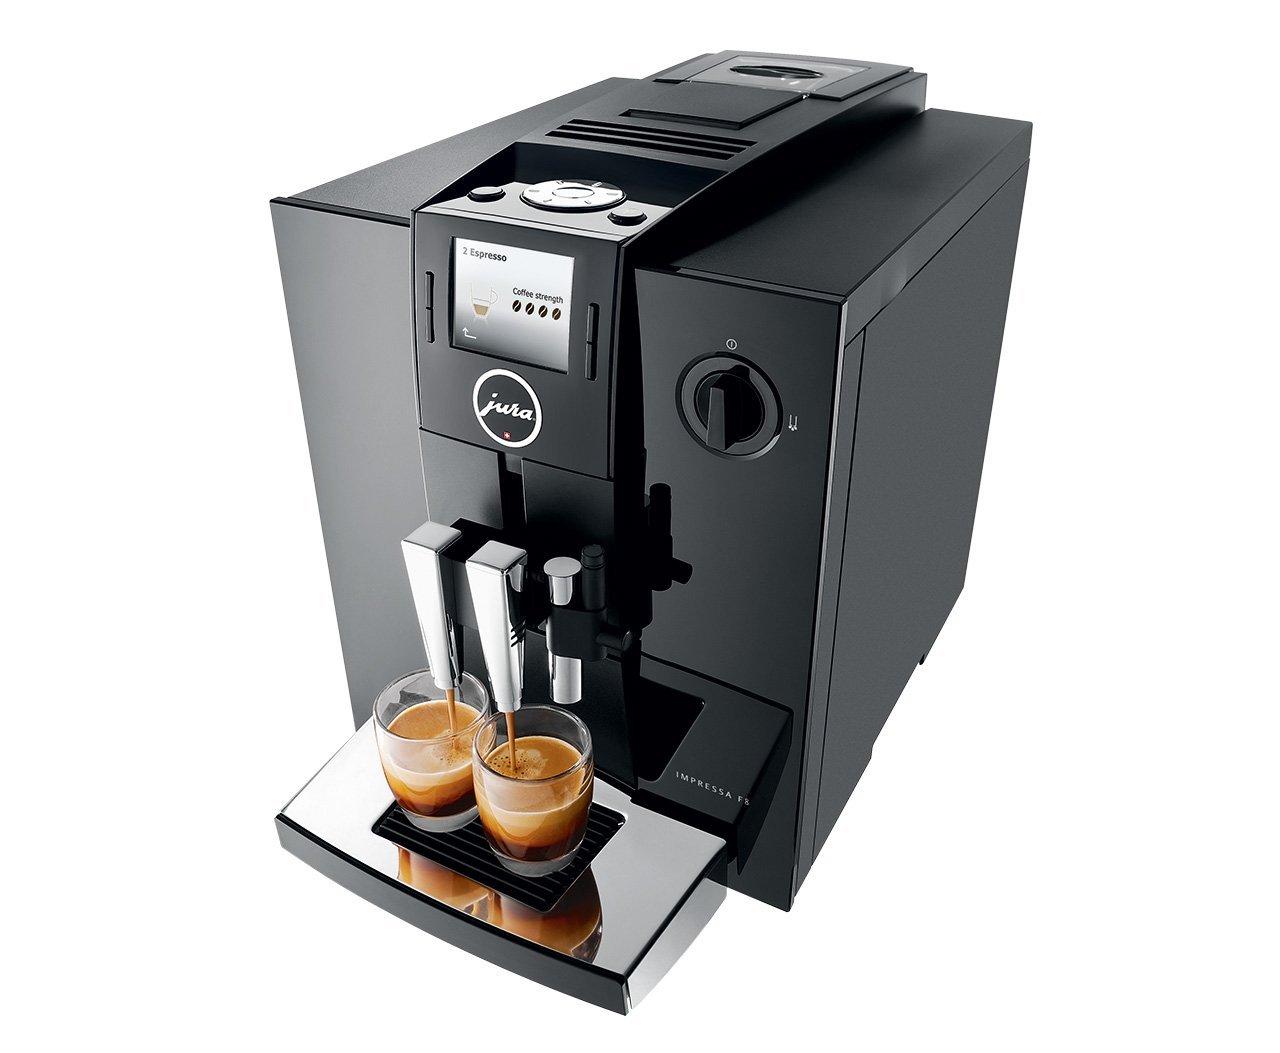 Impressa F8 TFT Espresso Machine